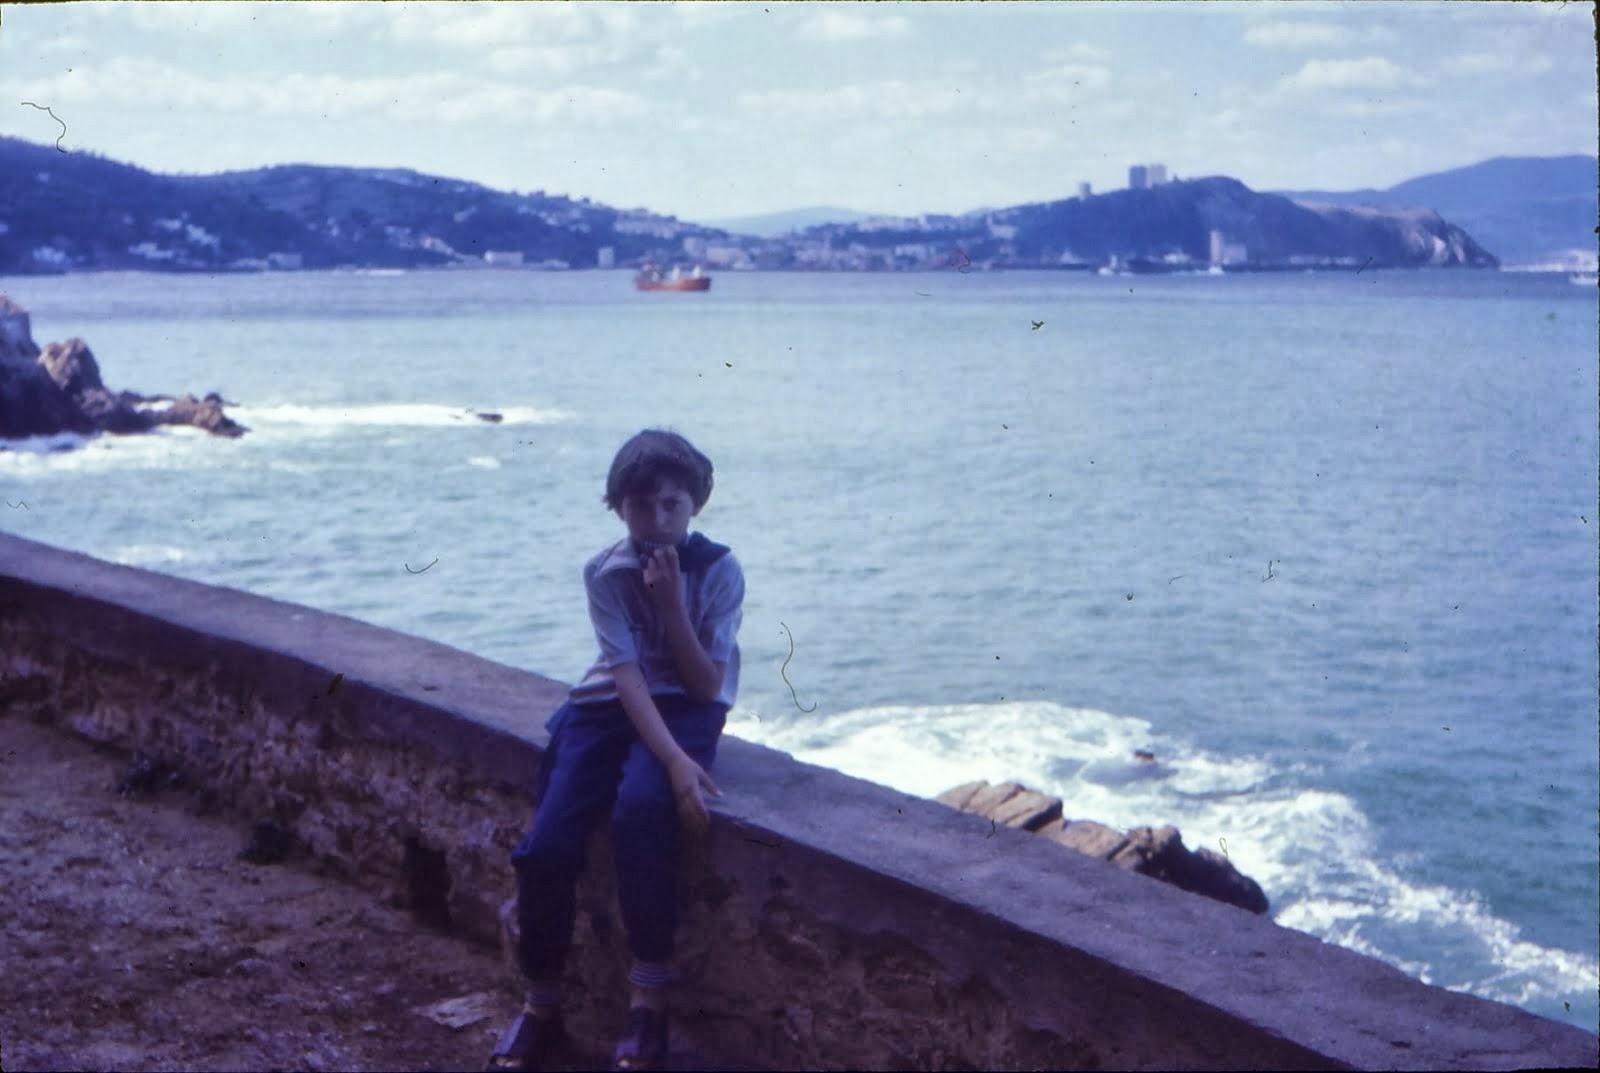 Petrutu Crãciunas anii 1976 la Marea Mediterana Algeria